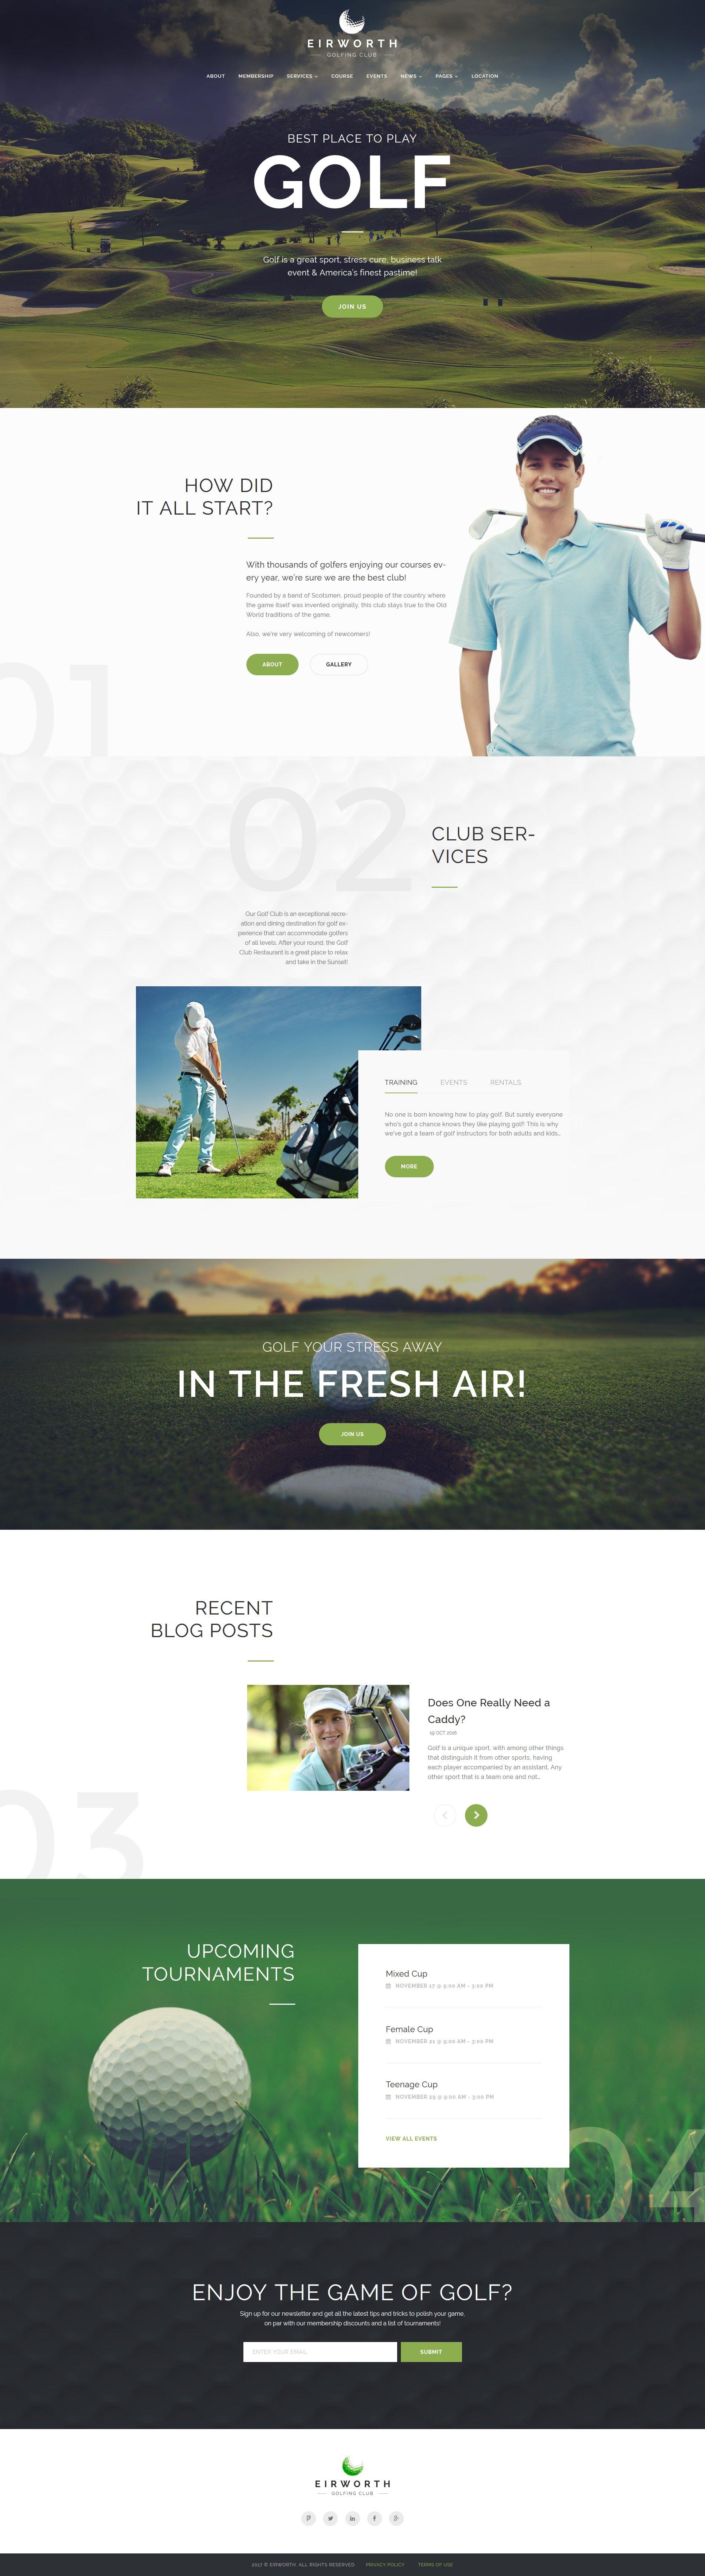 Адаптивный шаблон сайта на тему гольф #63966